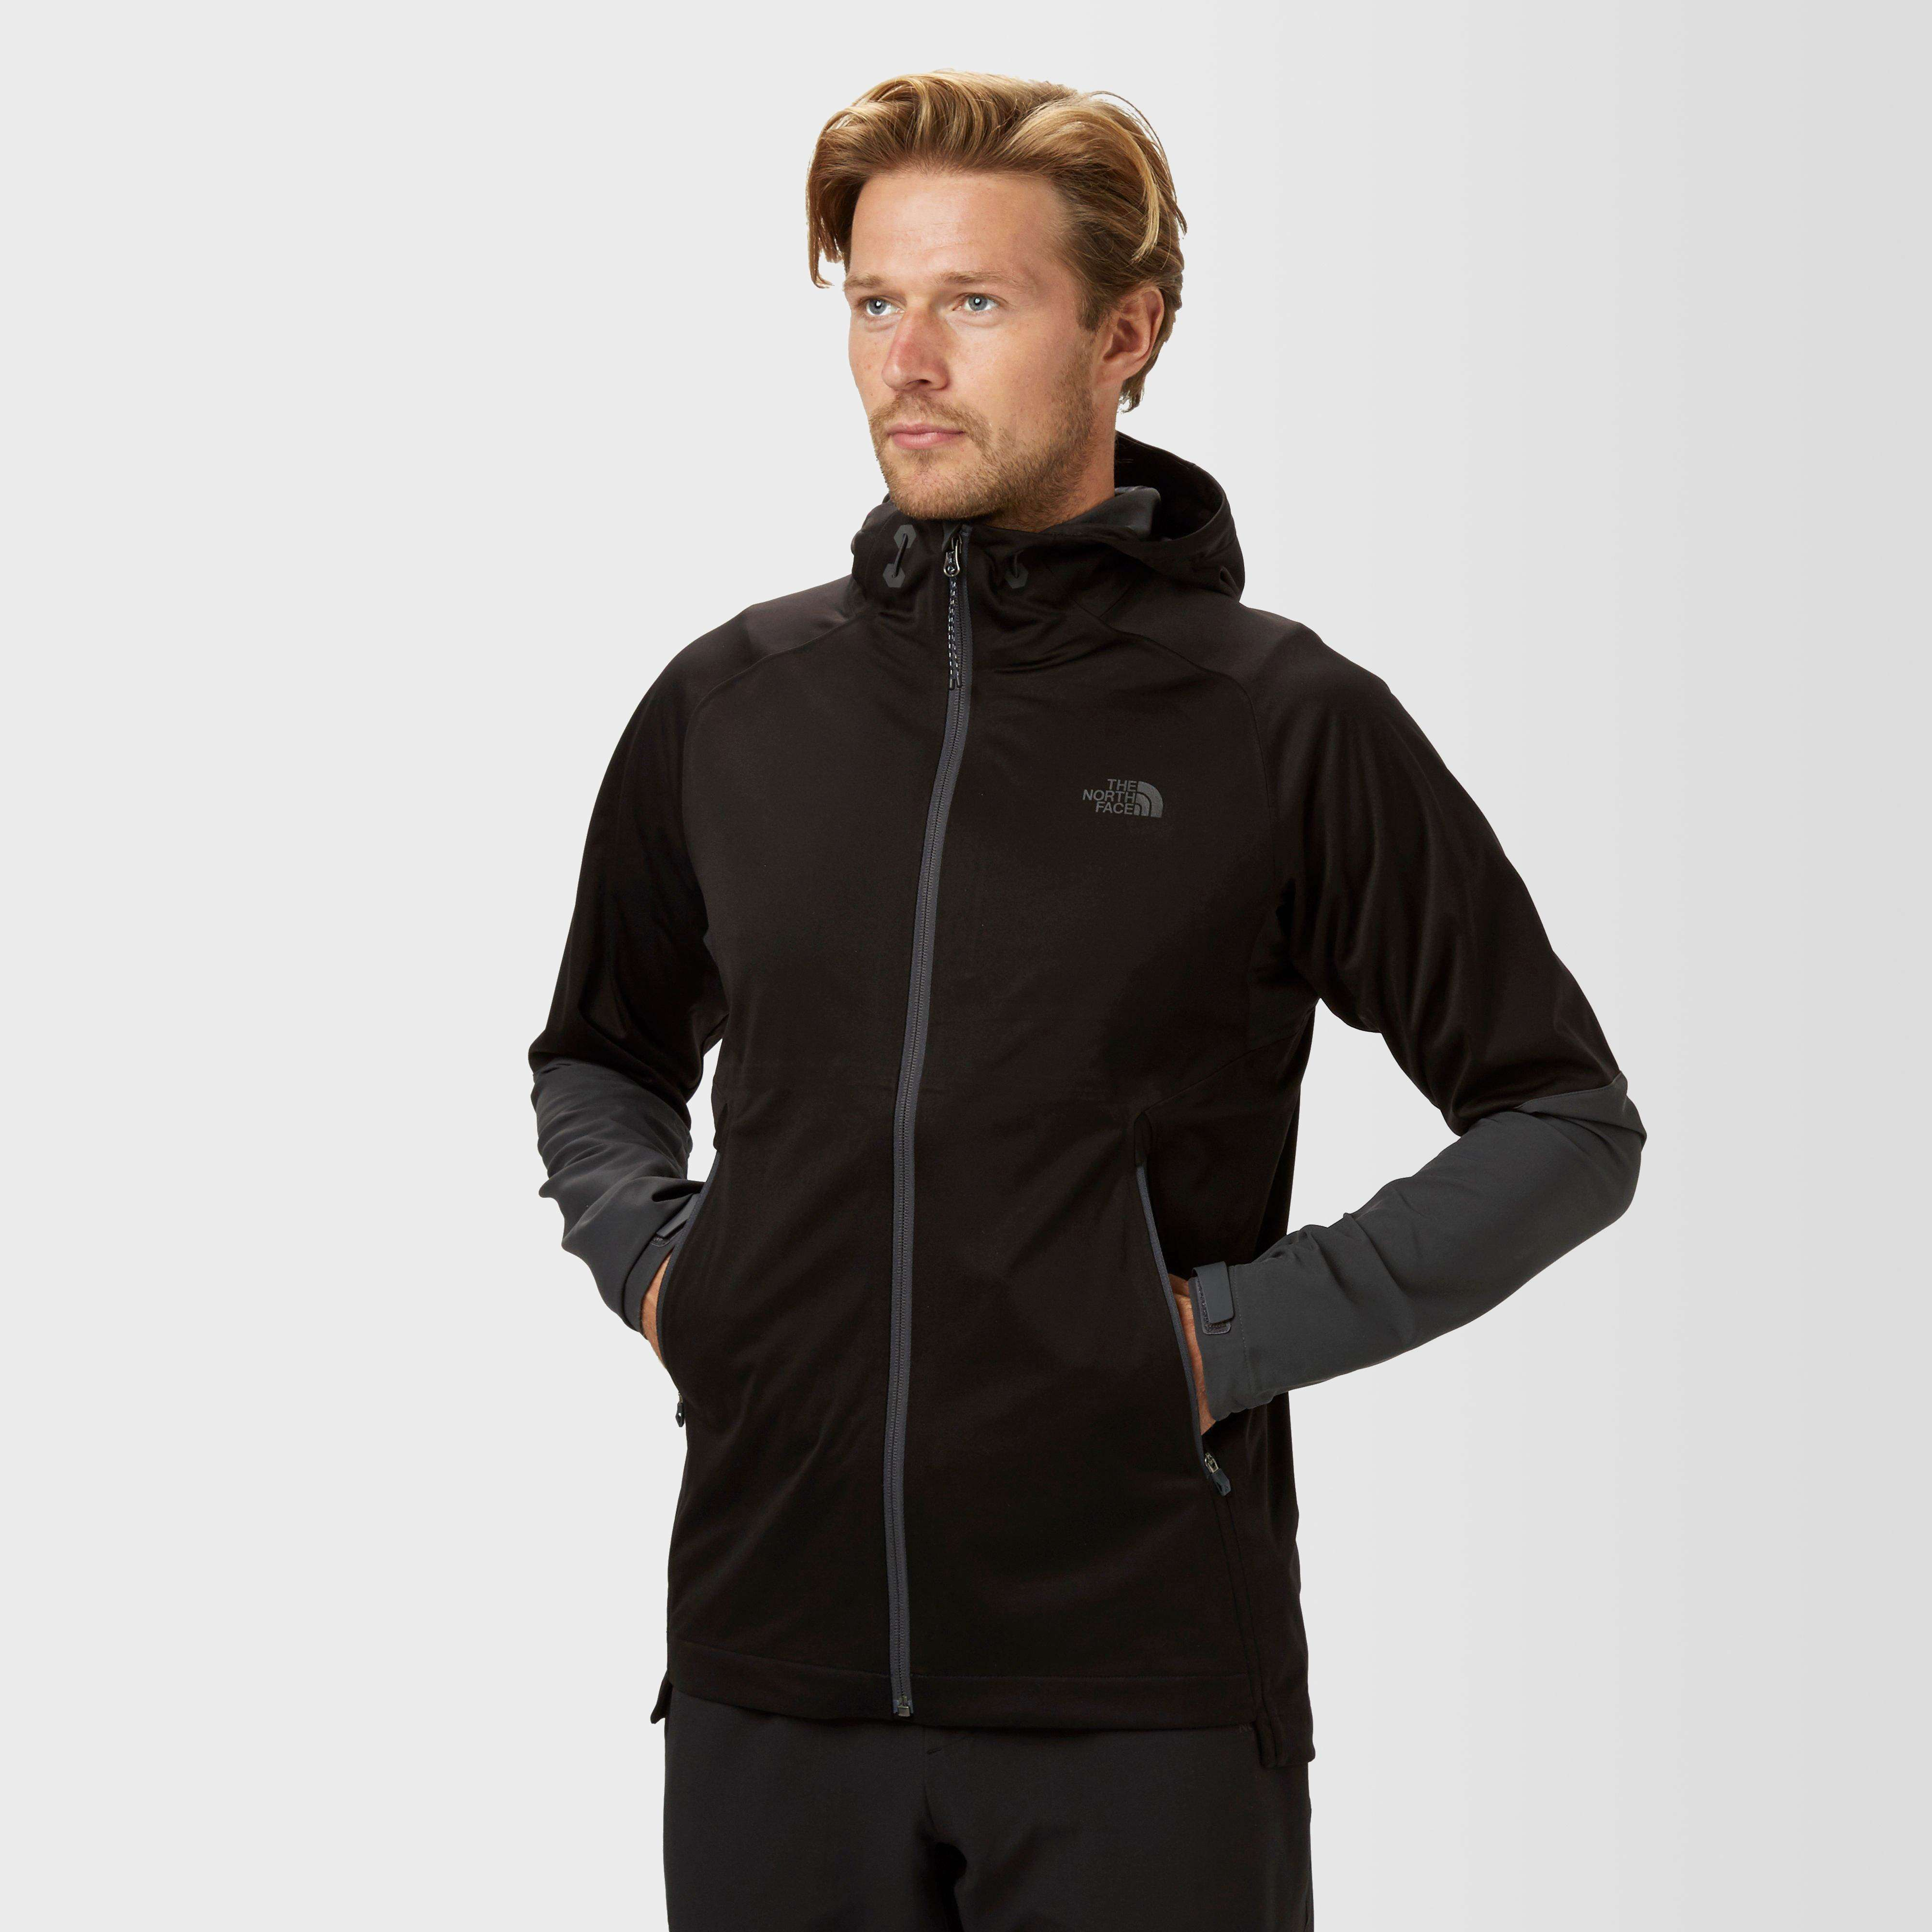 THE NORTH FACE Men's Terra Metro Softshell Jacket